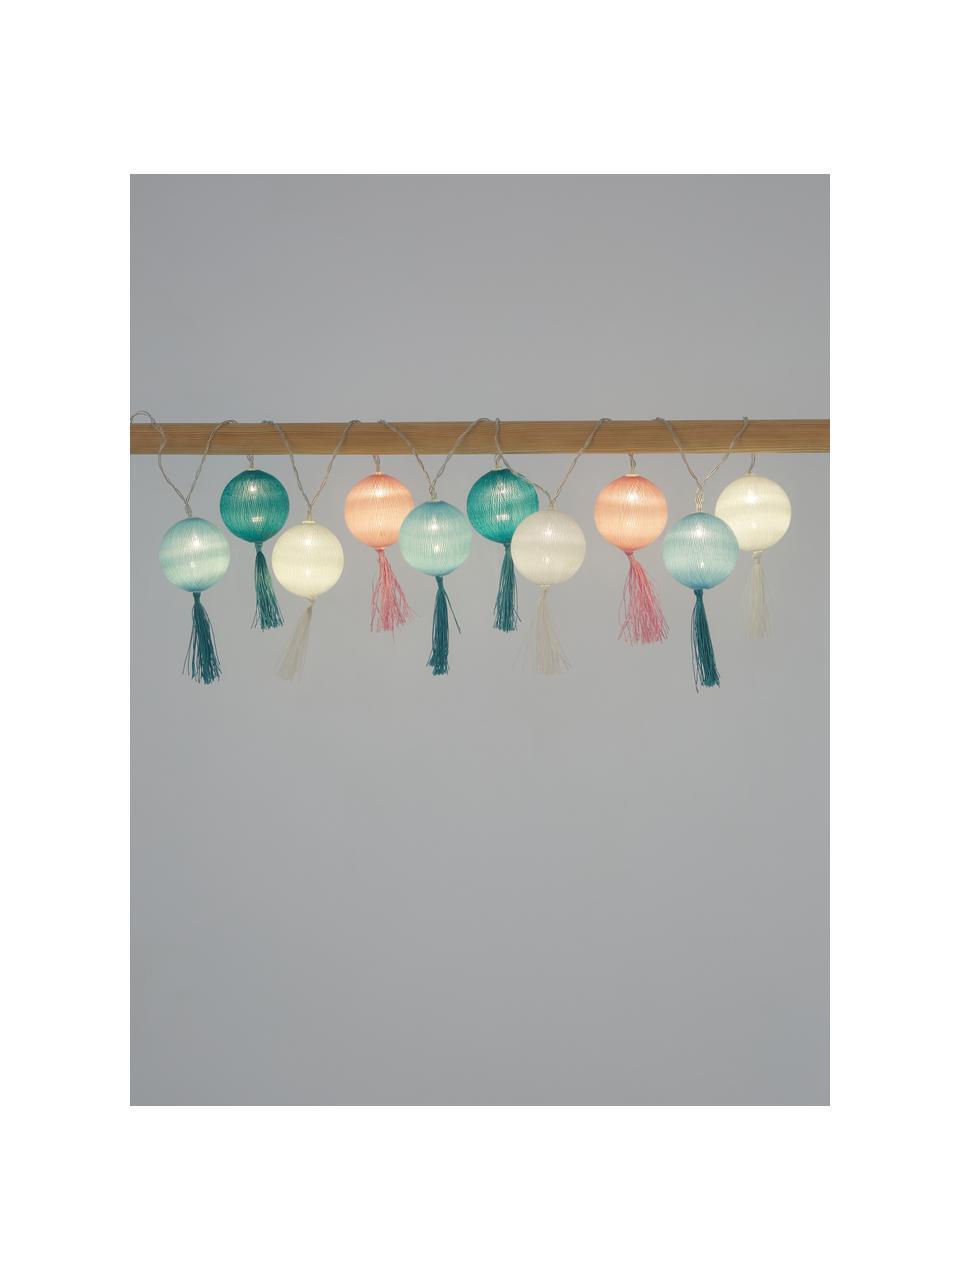 Ghirlanda a LED Jolly Tassel, 185 cm, 10 lampioni, Lanterne: cotone, Bianco, rosa, verde, blu, Lung. 185 cm